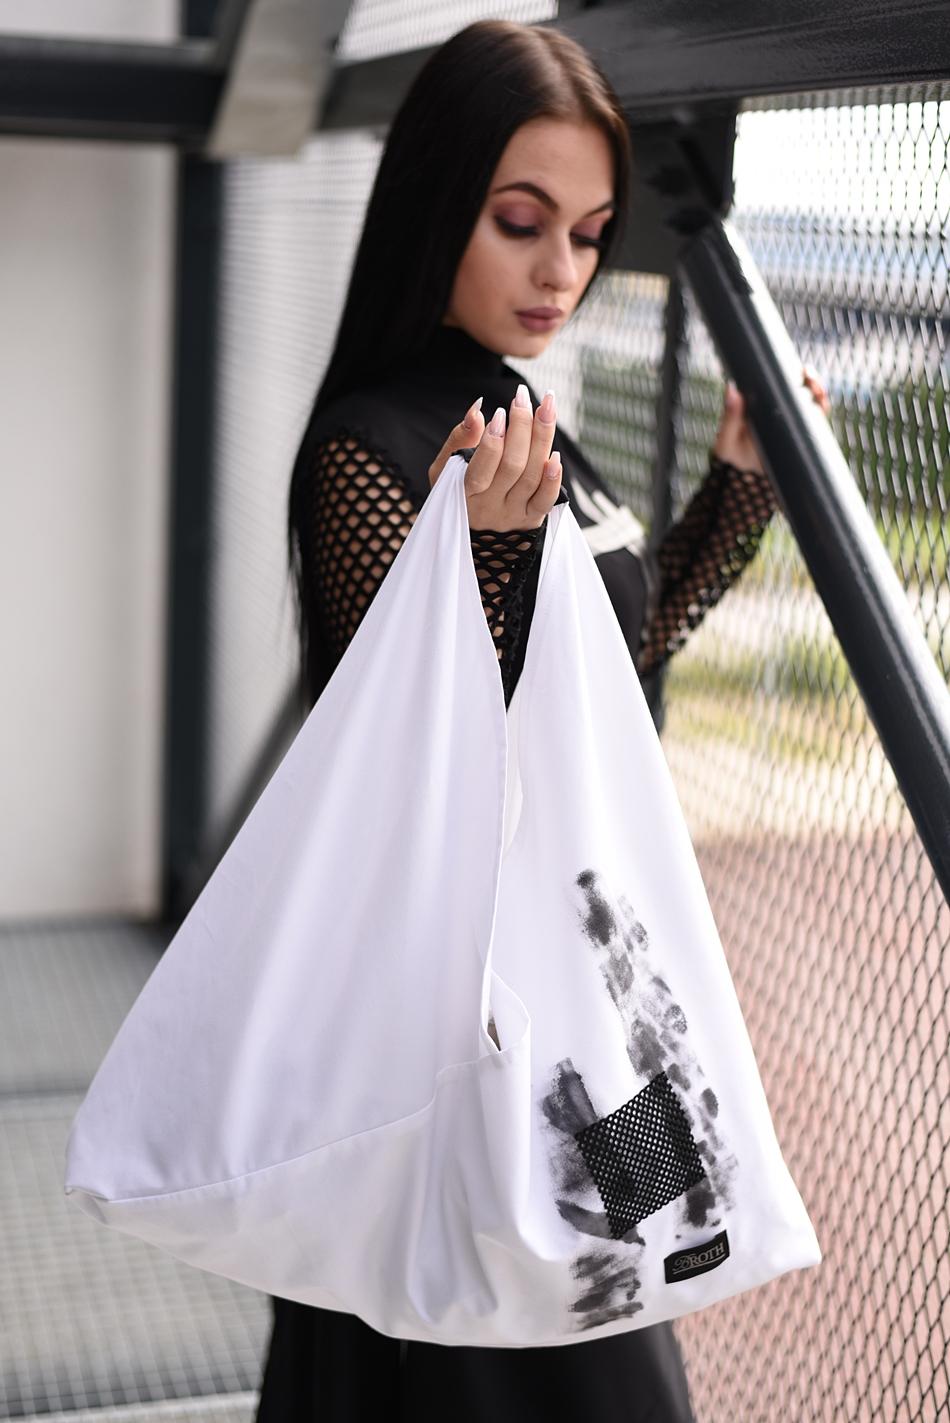 Broth_design_clothes_022